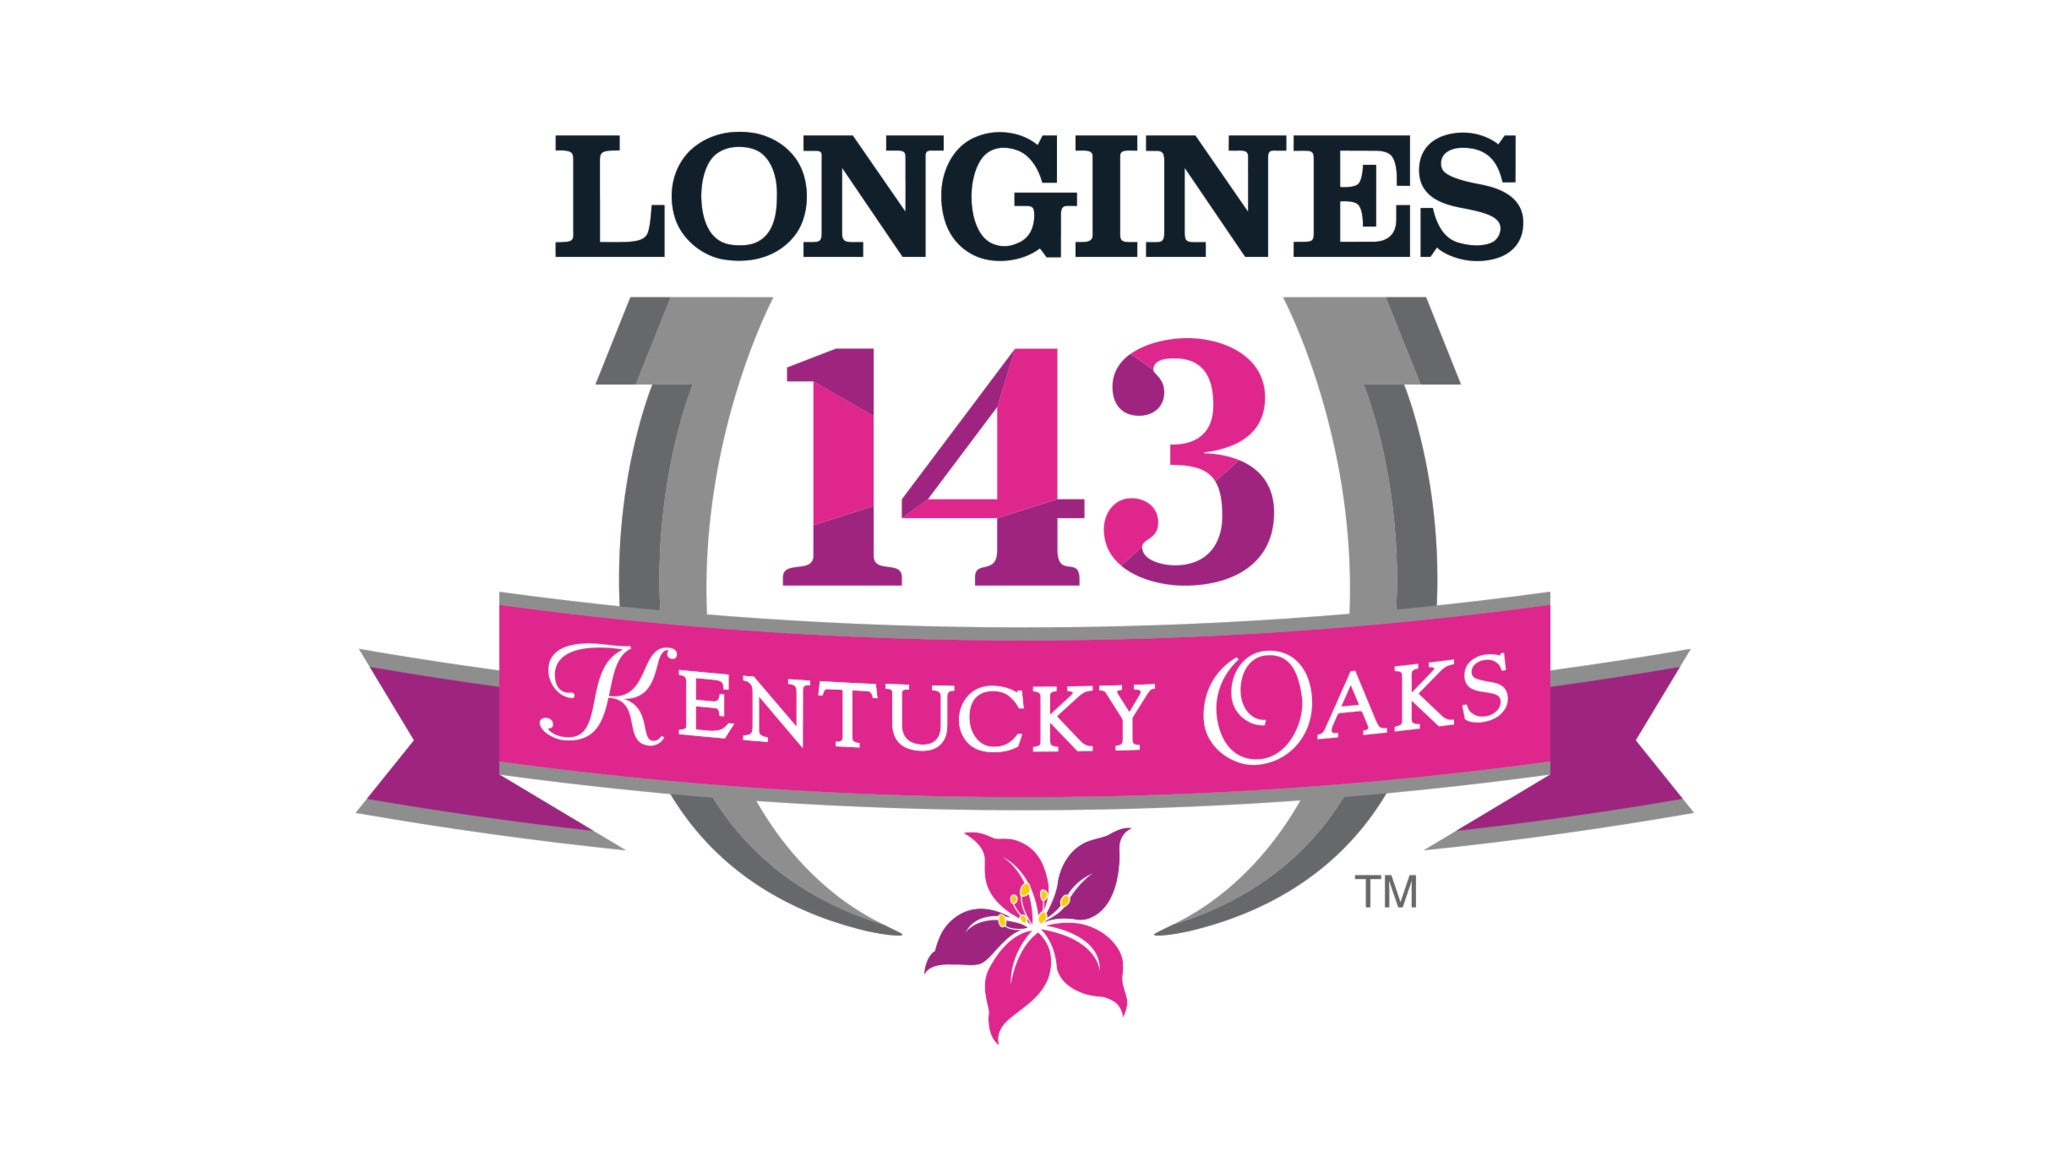 143rd Kentucky Oaks - Clubhouse Walk - No Seat